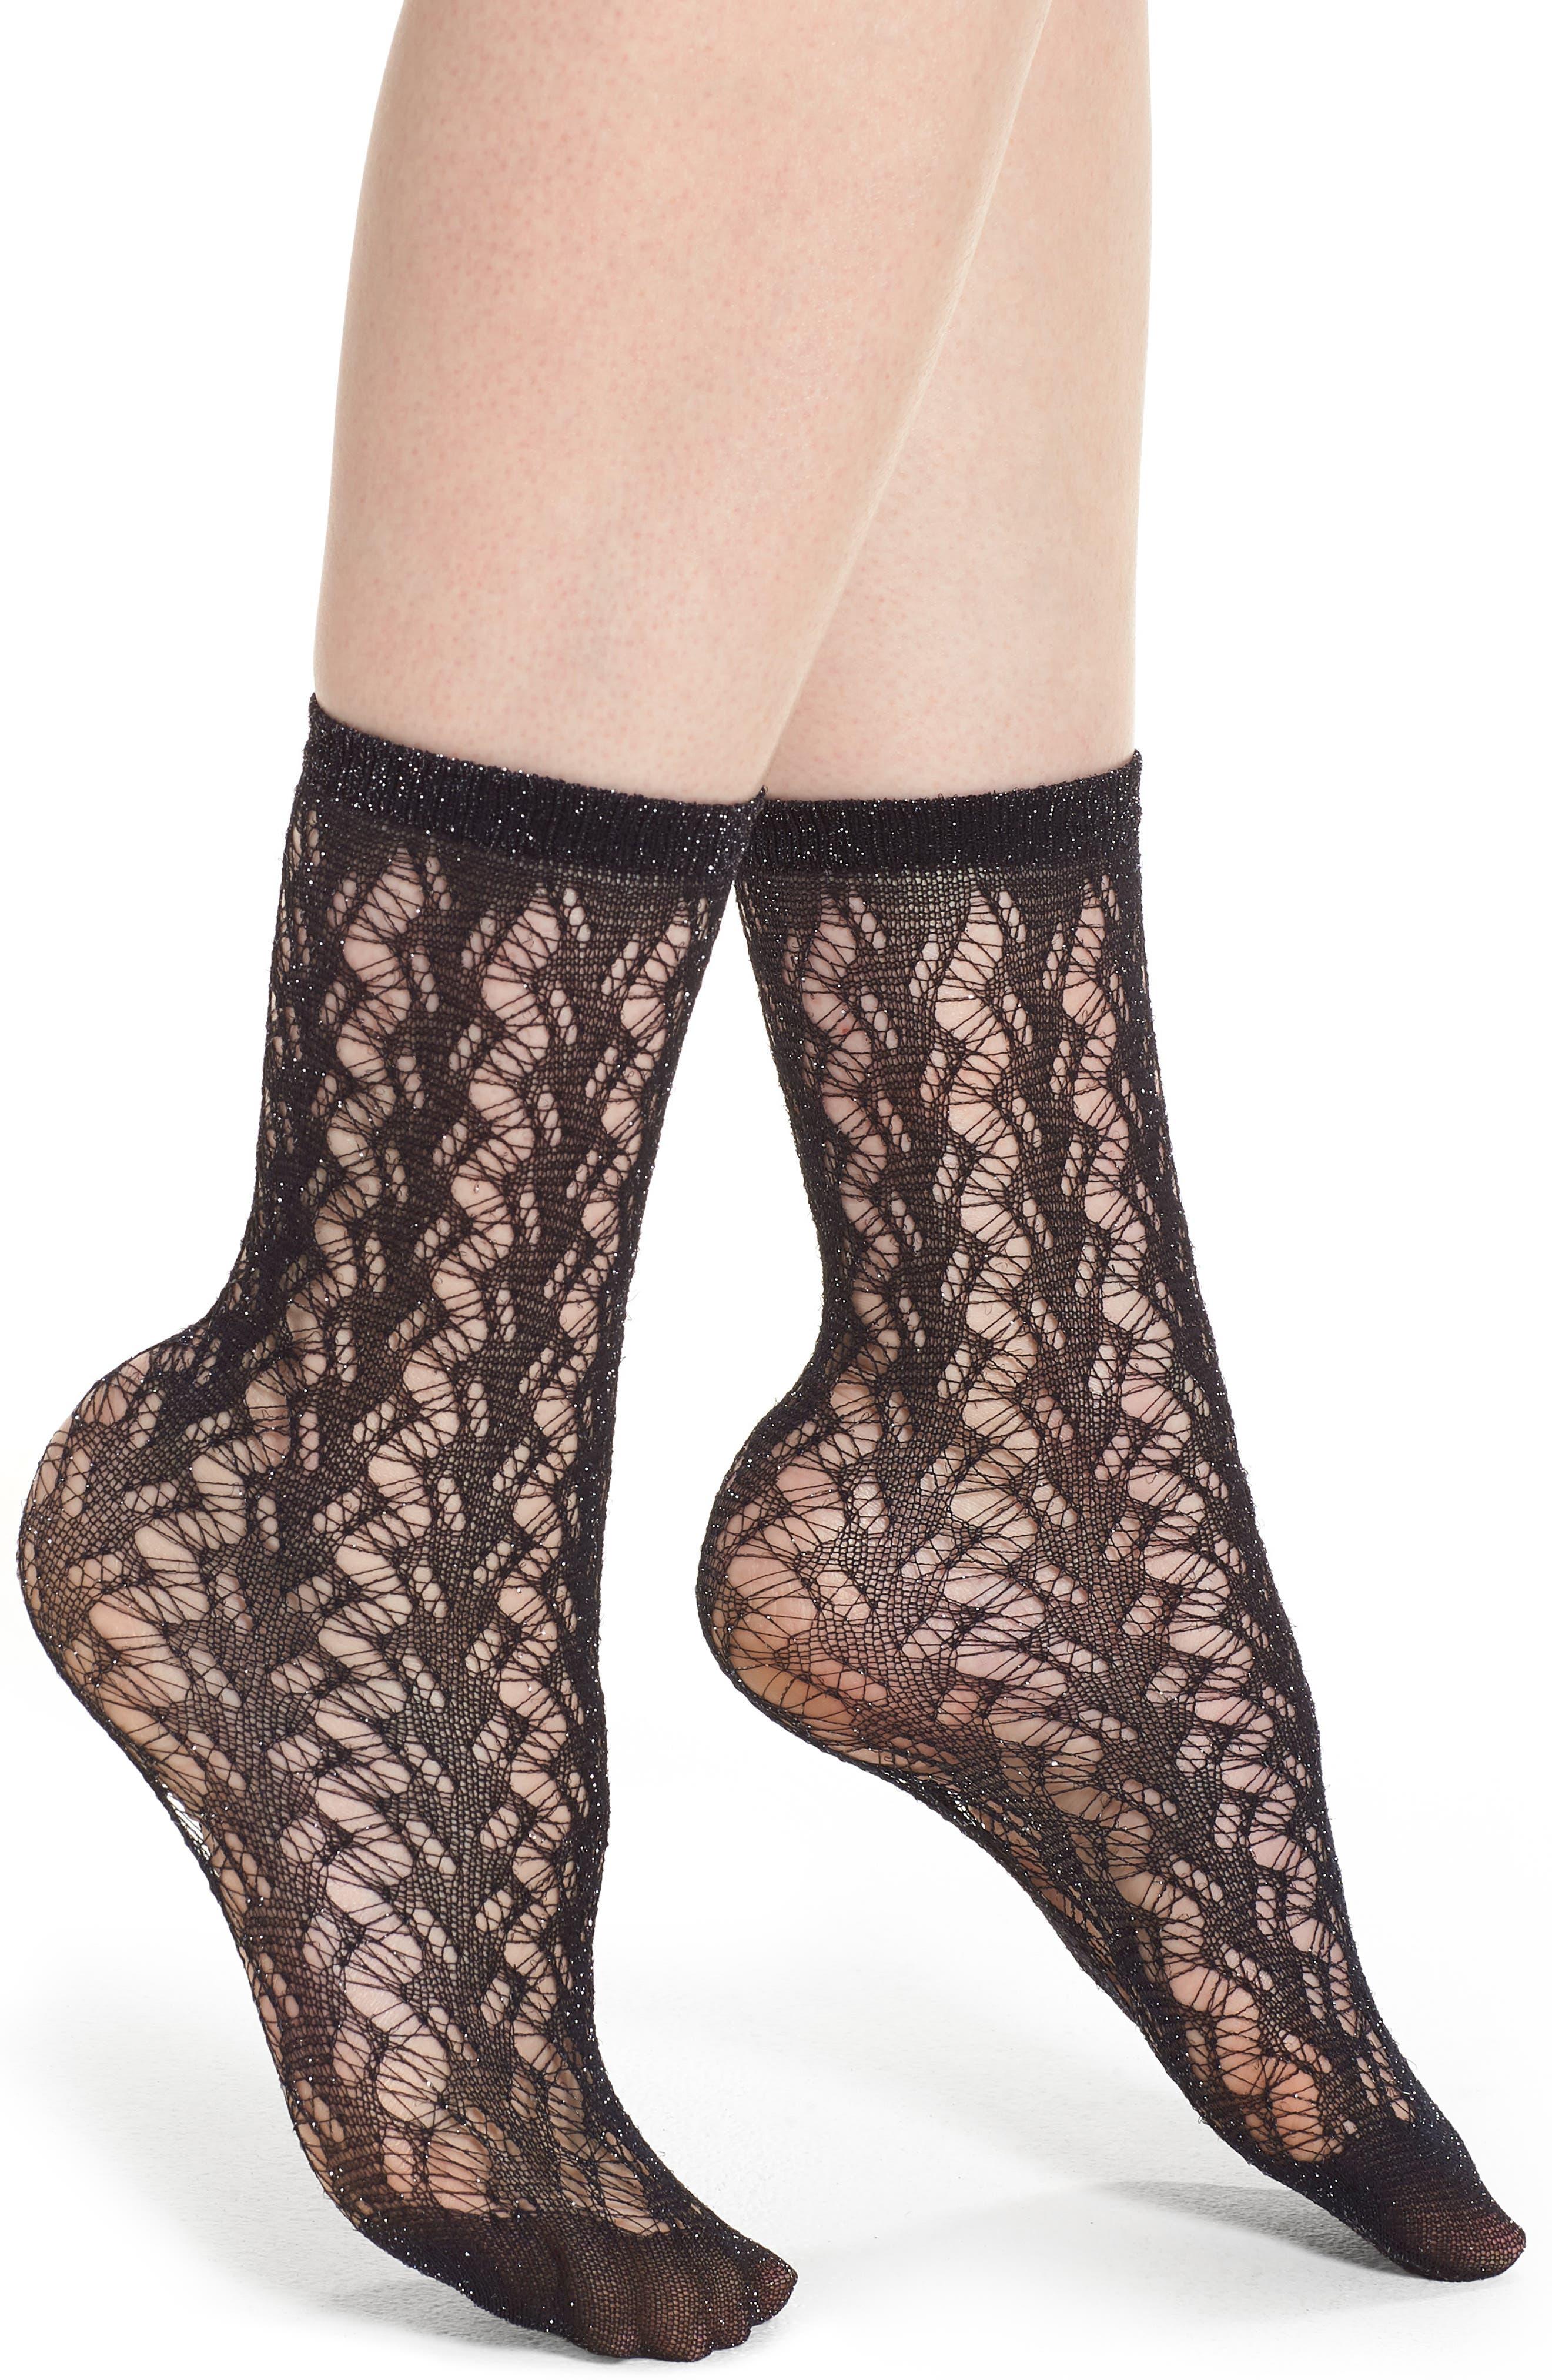 Calzino Glitter Fishnet Trouser Socks,                             Main thumbnail 1, color,                             001